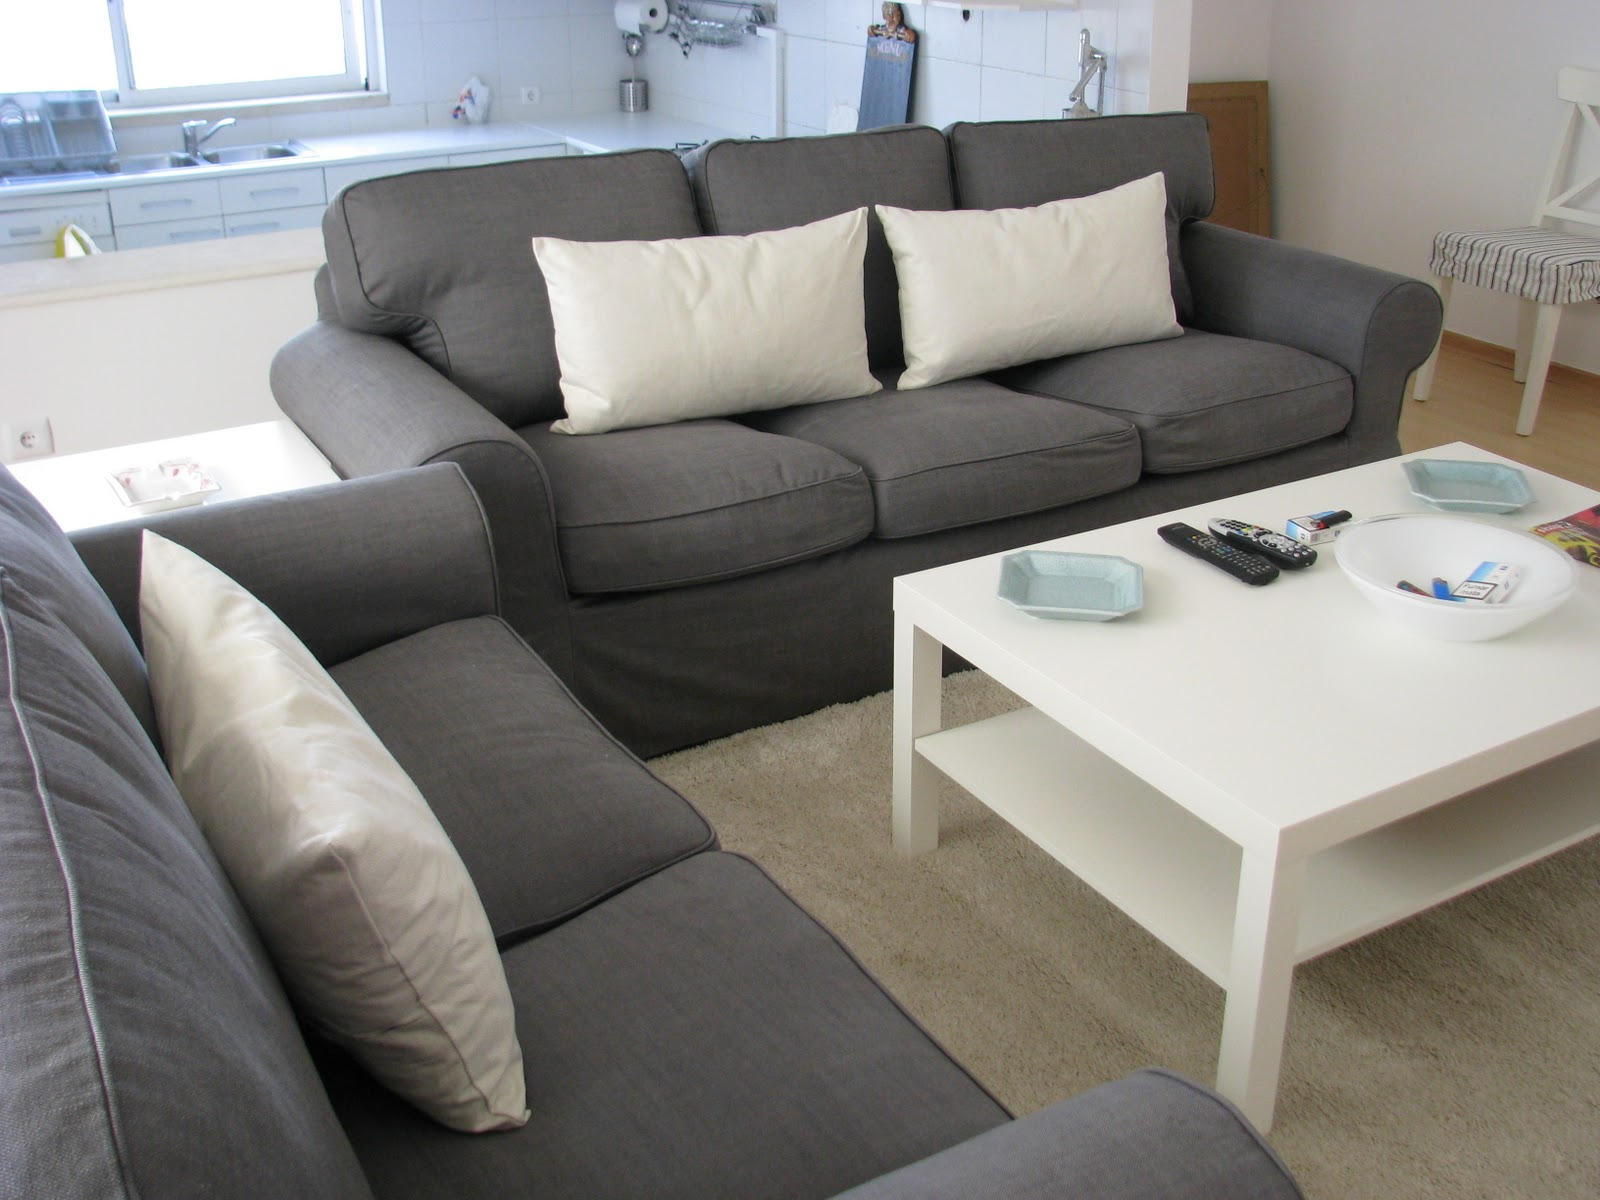 maison douce mom 39 s guest house. Black Bedroom Furniture Sets. Home Design Ideas